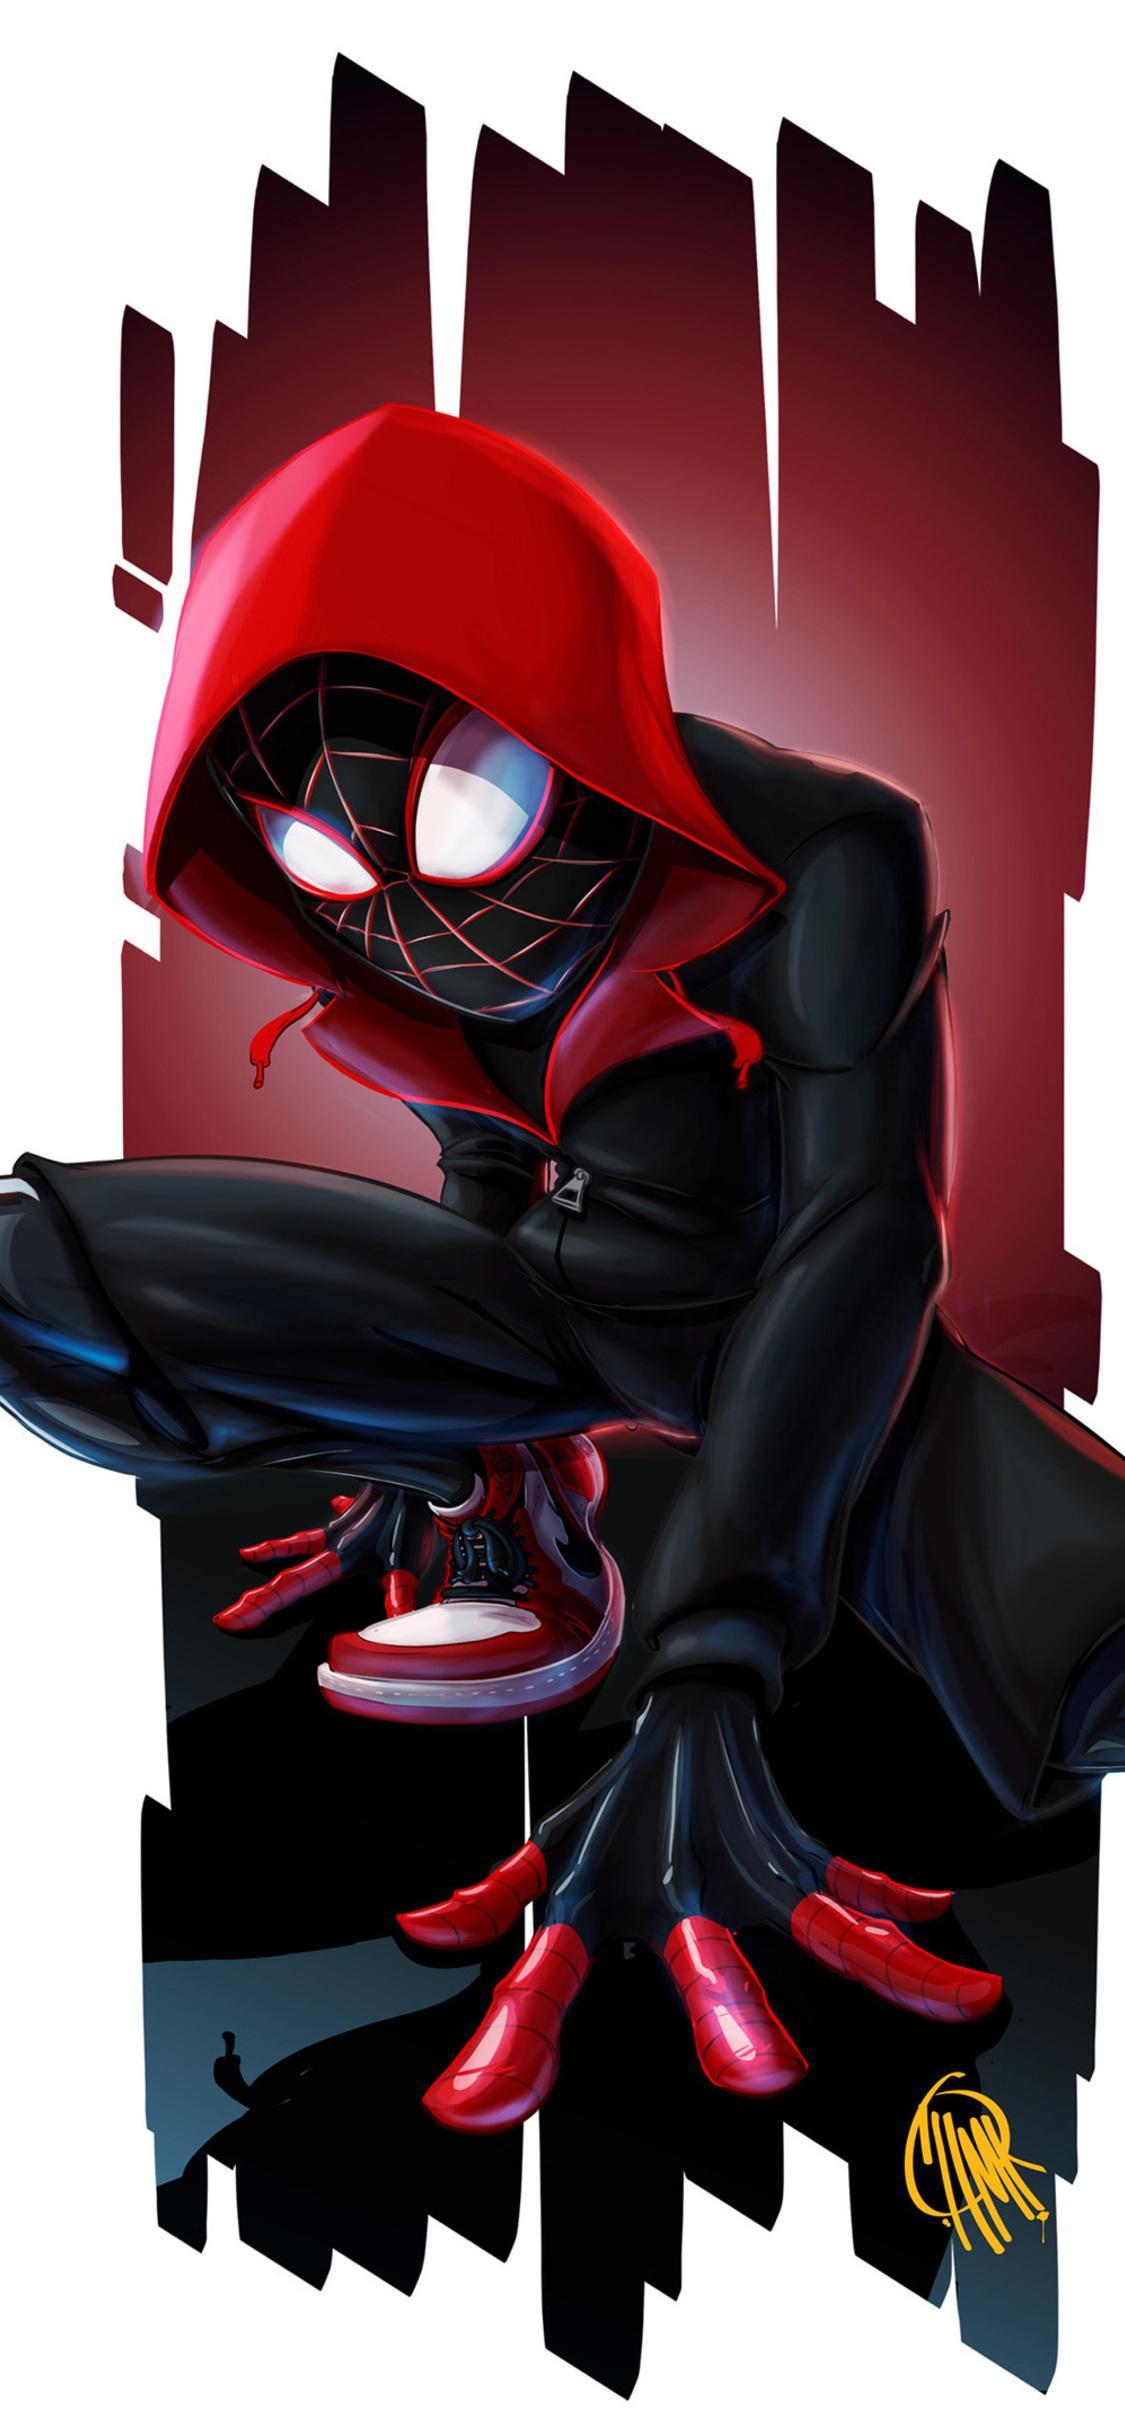 Miles Morales Spider-Man Wallpapers - Wallpaper Cave